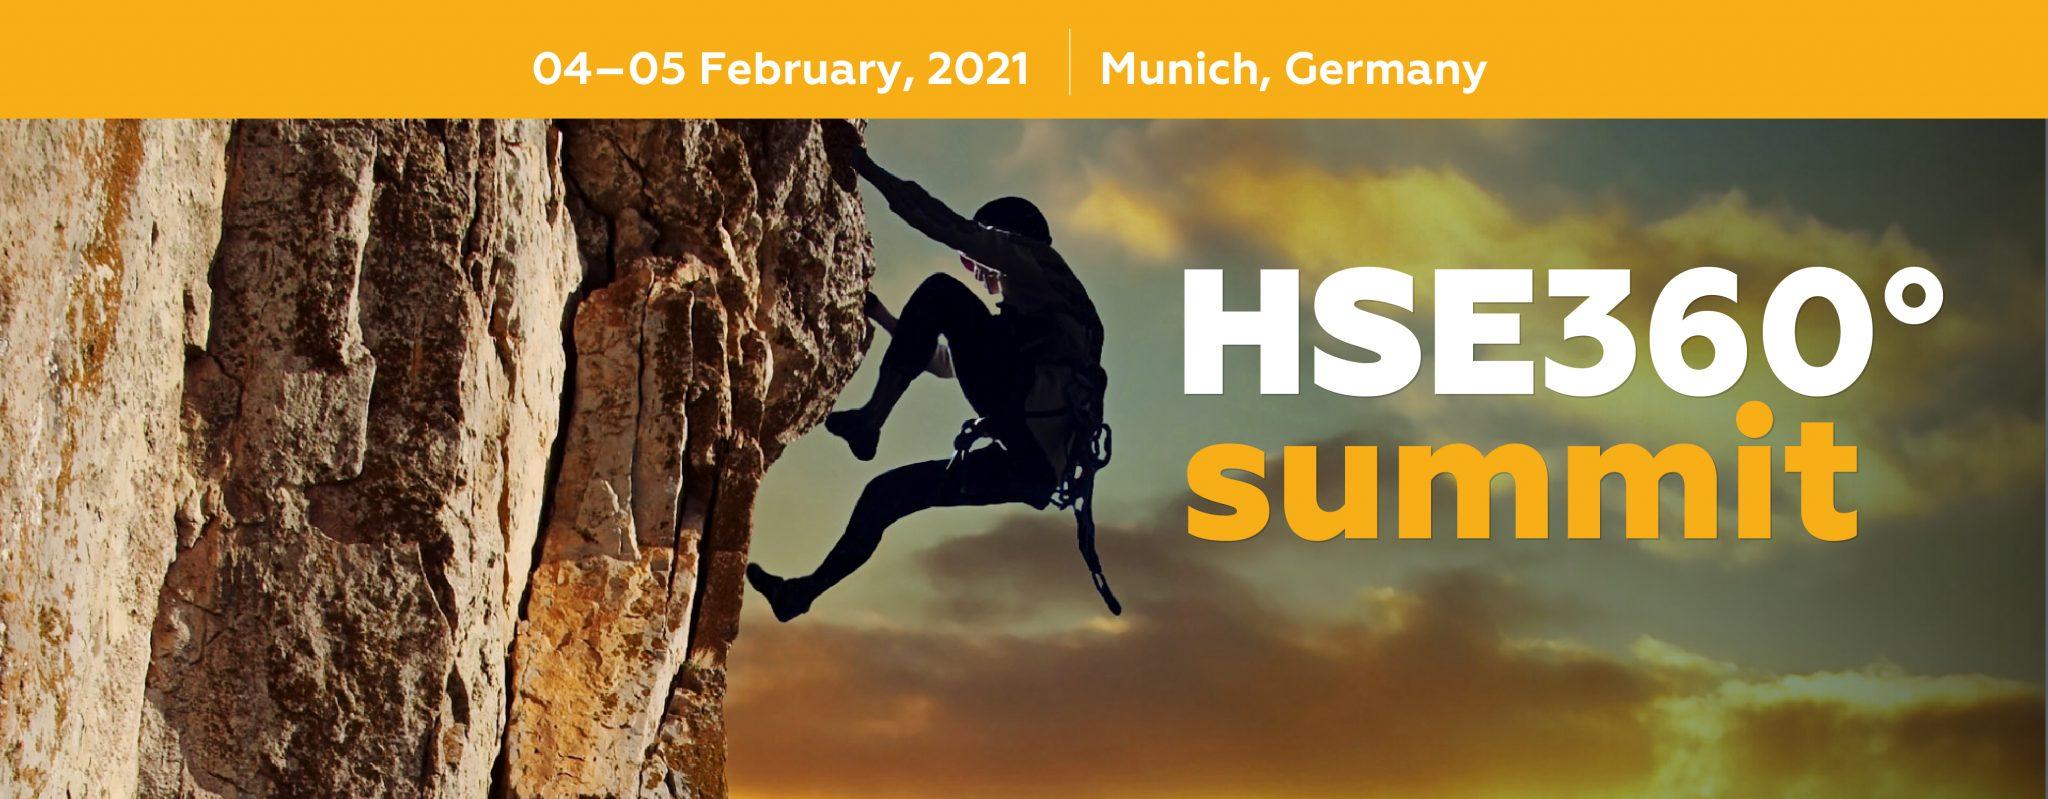 hse360_landing-page-01